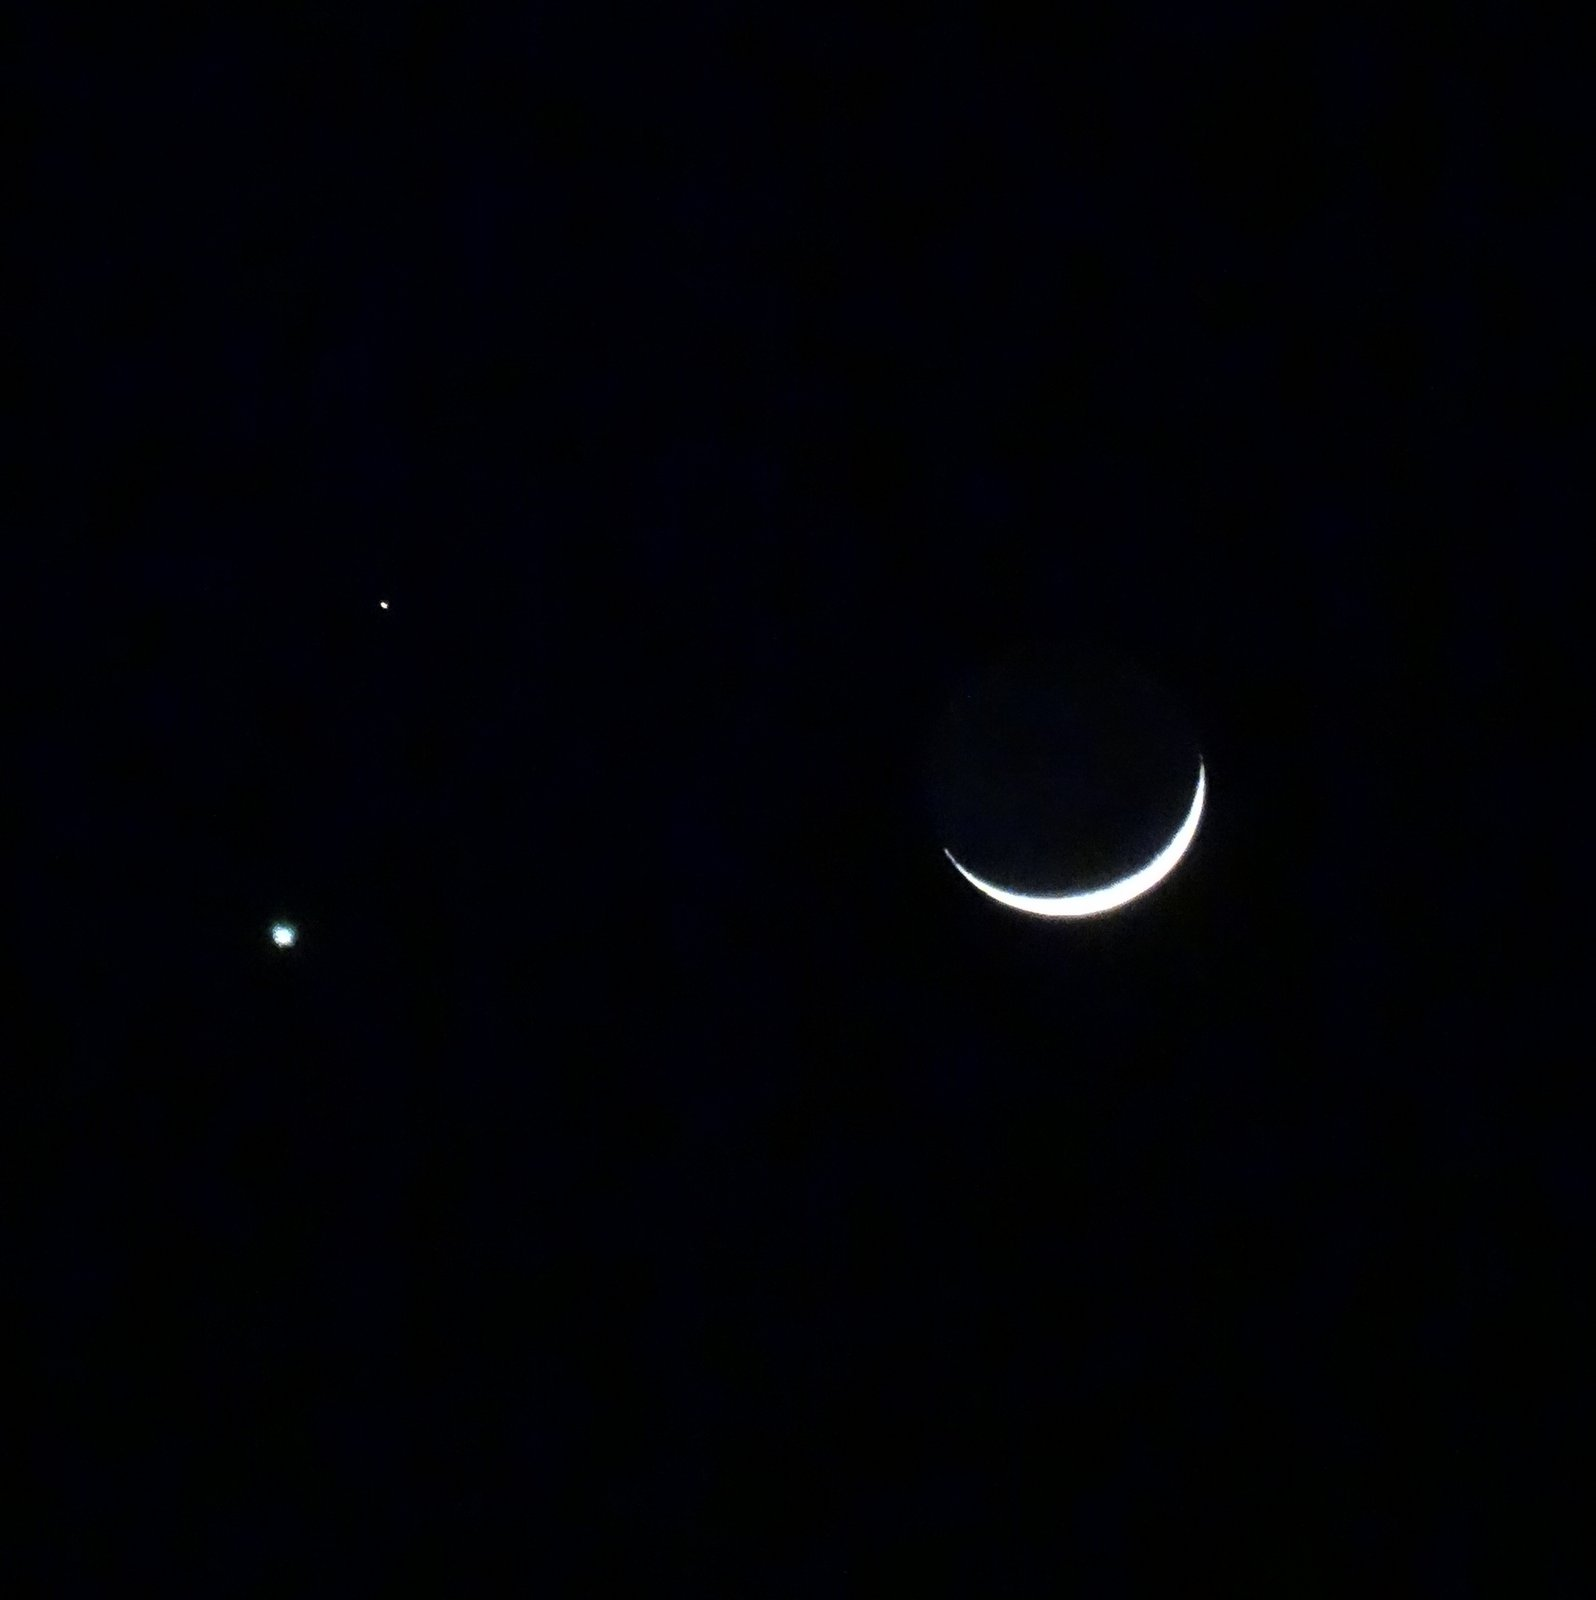 mars venus moon conjunction photos - photo #37